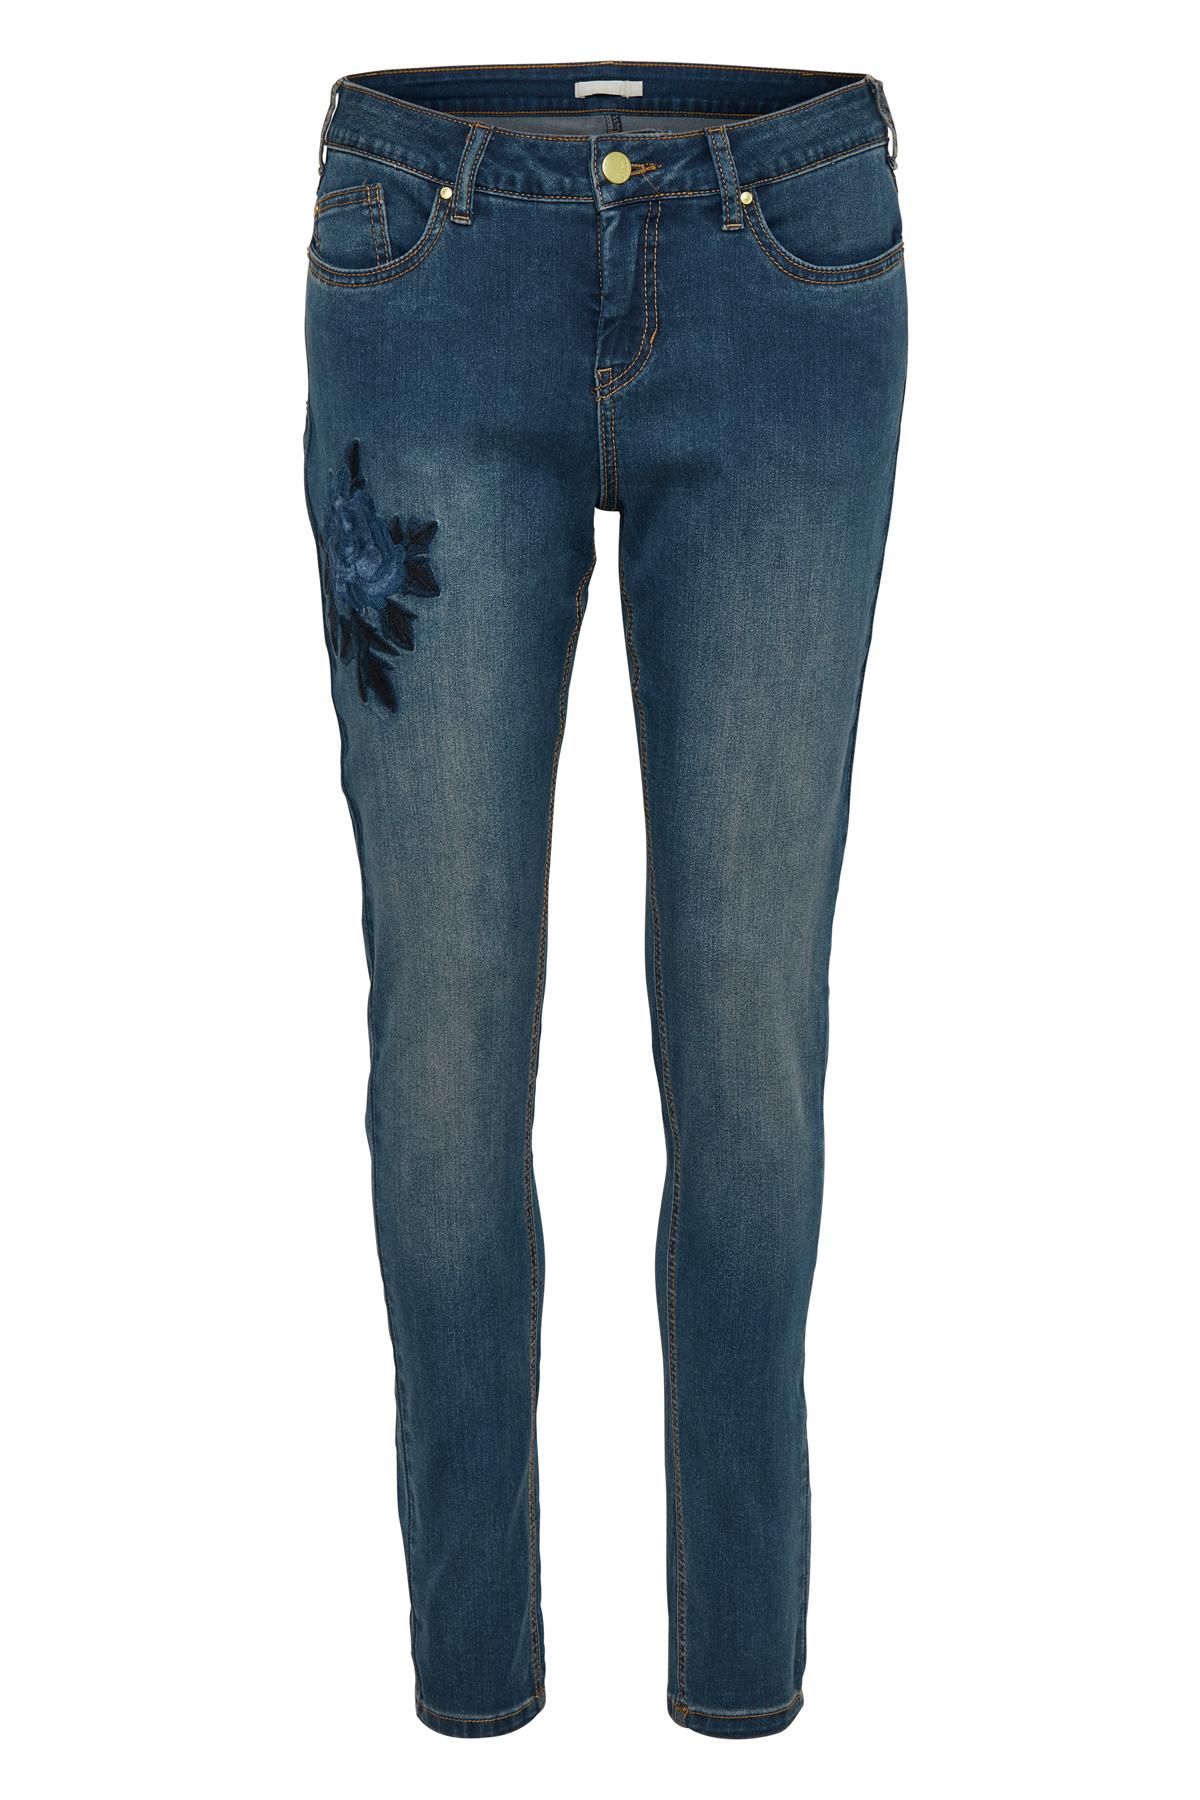 Mörk denimblå Jeans från Bon'A Parte – Köp Mörk denimblå Jeans från stl. 36-48 här